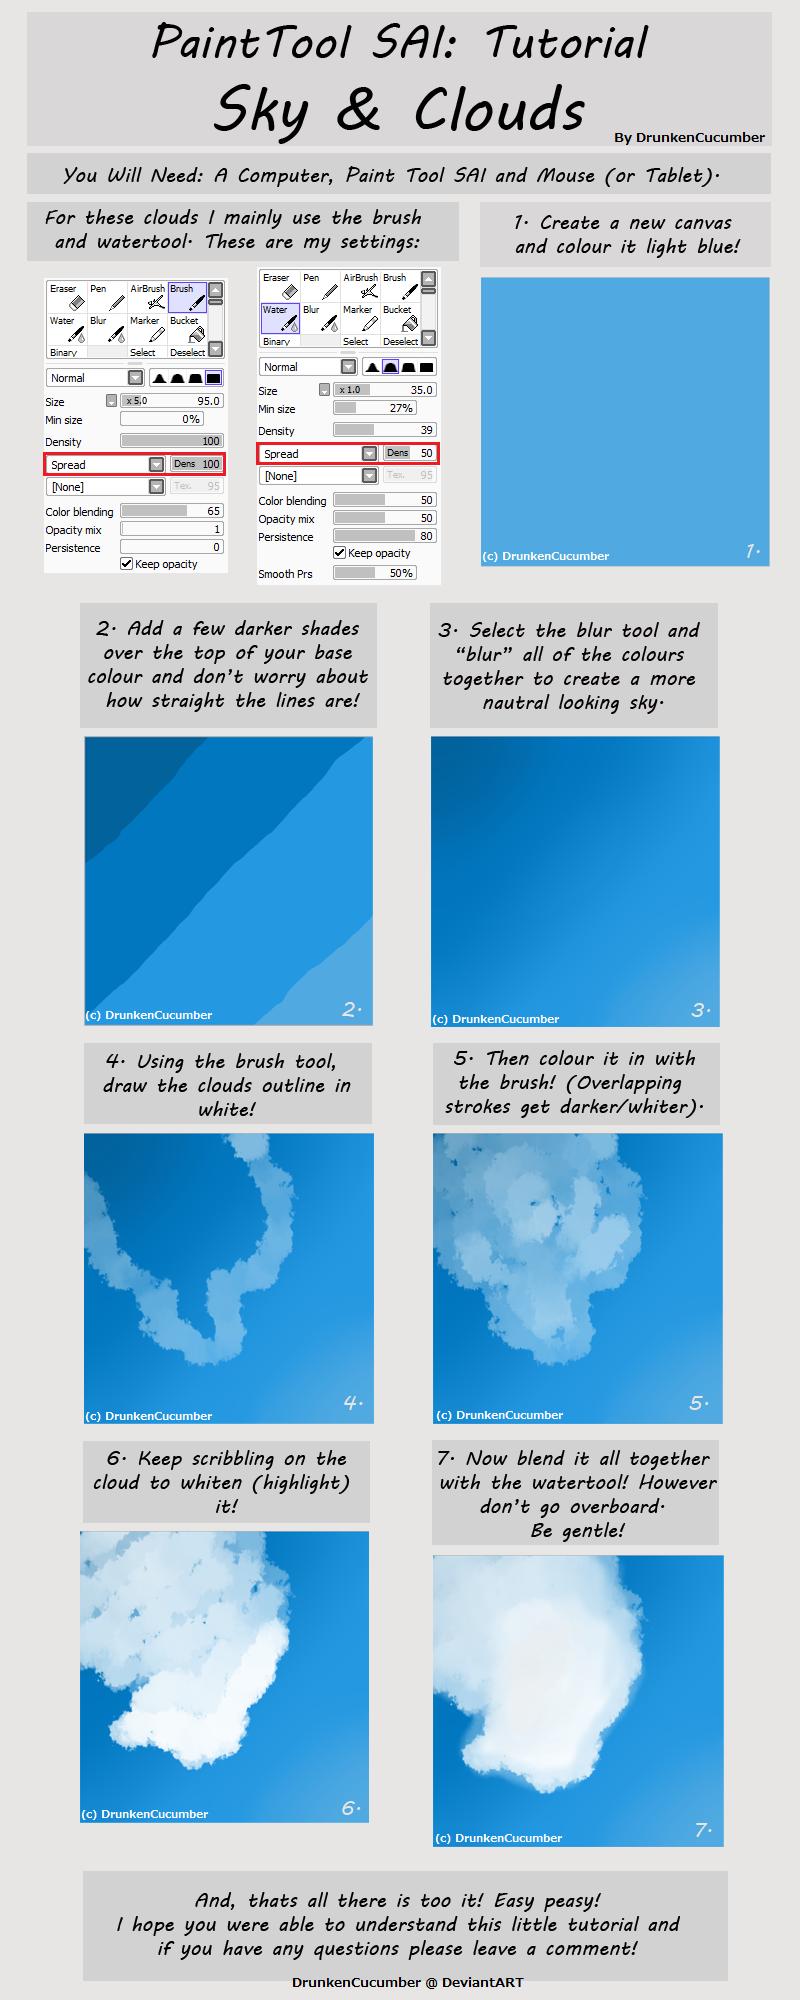 Paint Tool Sai: Cloud Tutorial By Drunkencucumberiantart On  @deviantart